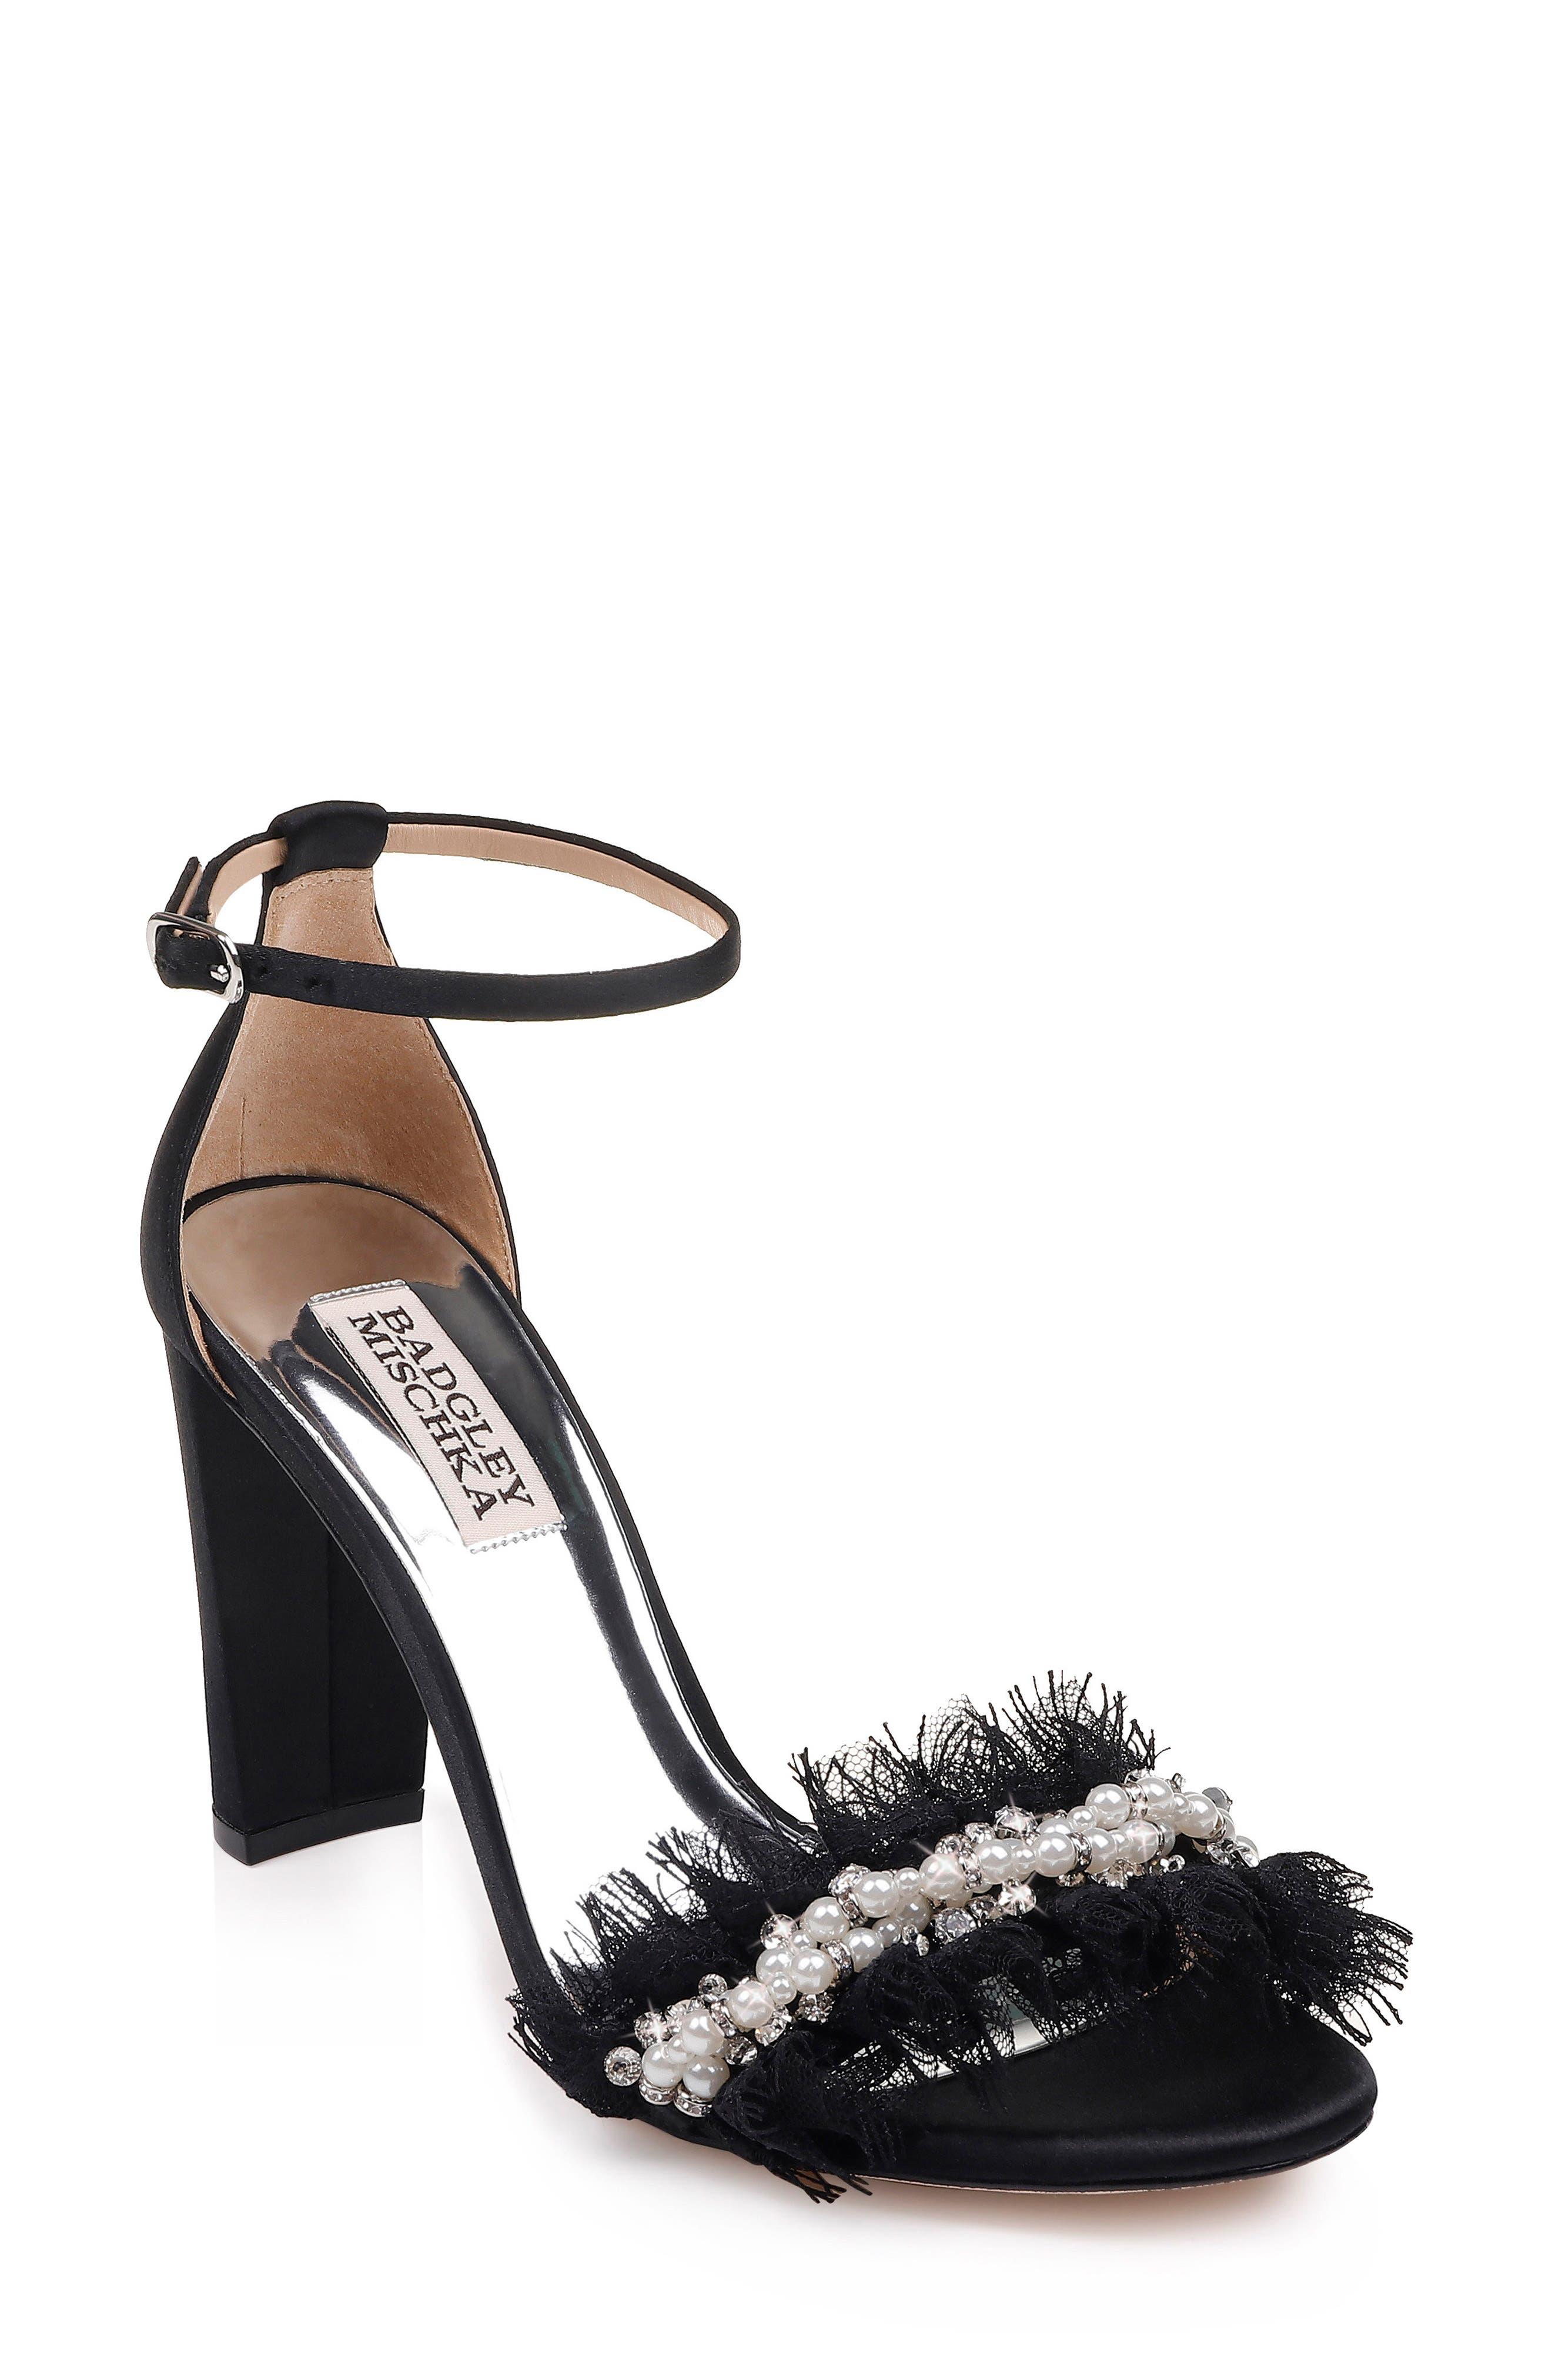 Badgley Mischka Fleur Ankle Strap Sandal,                             Main thumbnail 1, color,                             BLACK SATIN/ CHIFFON